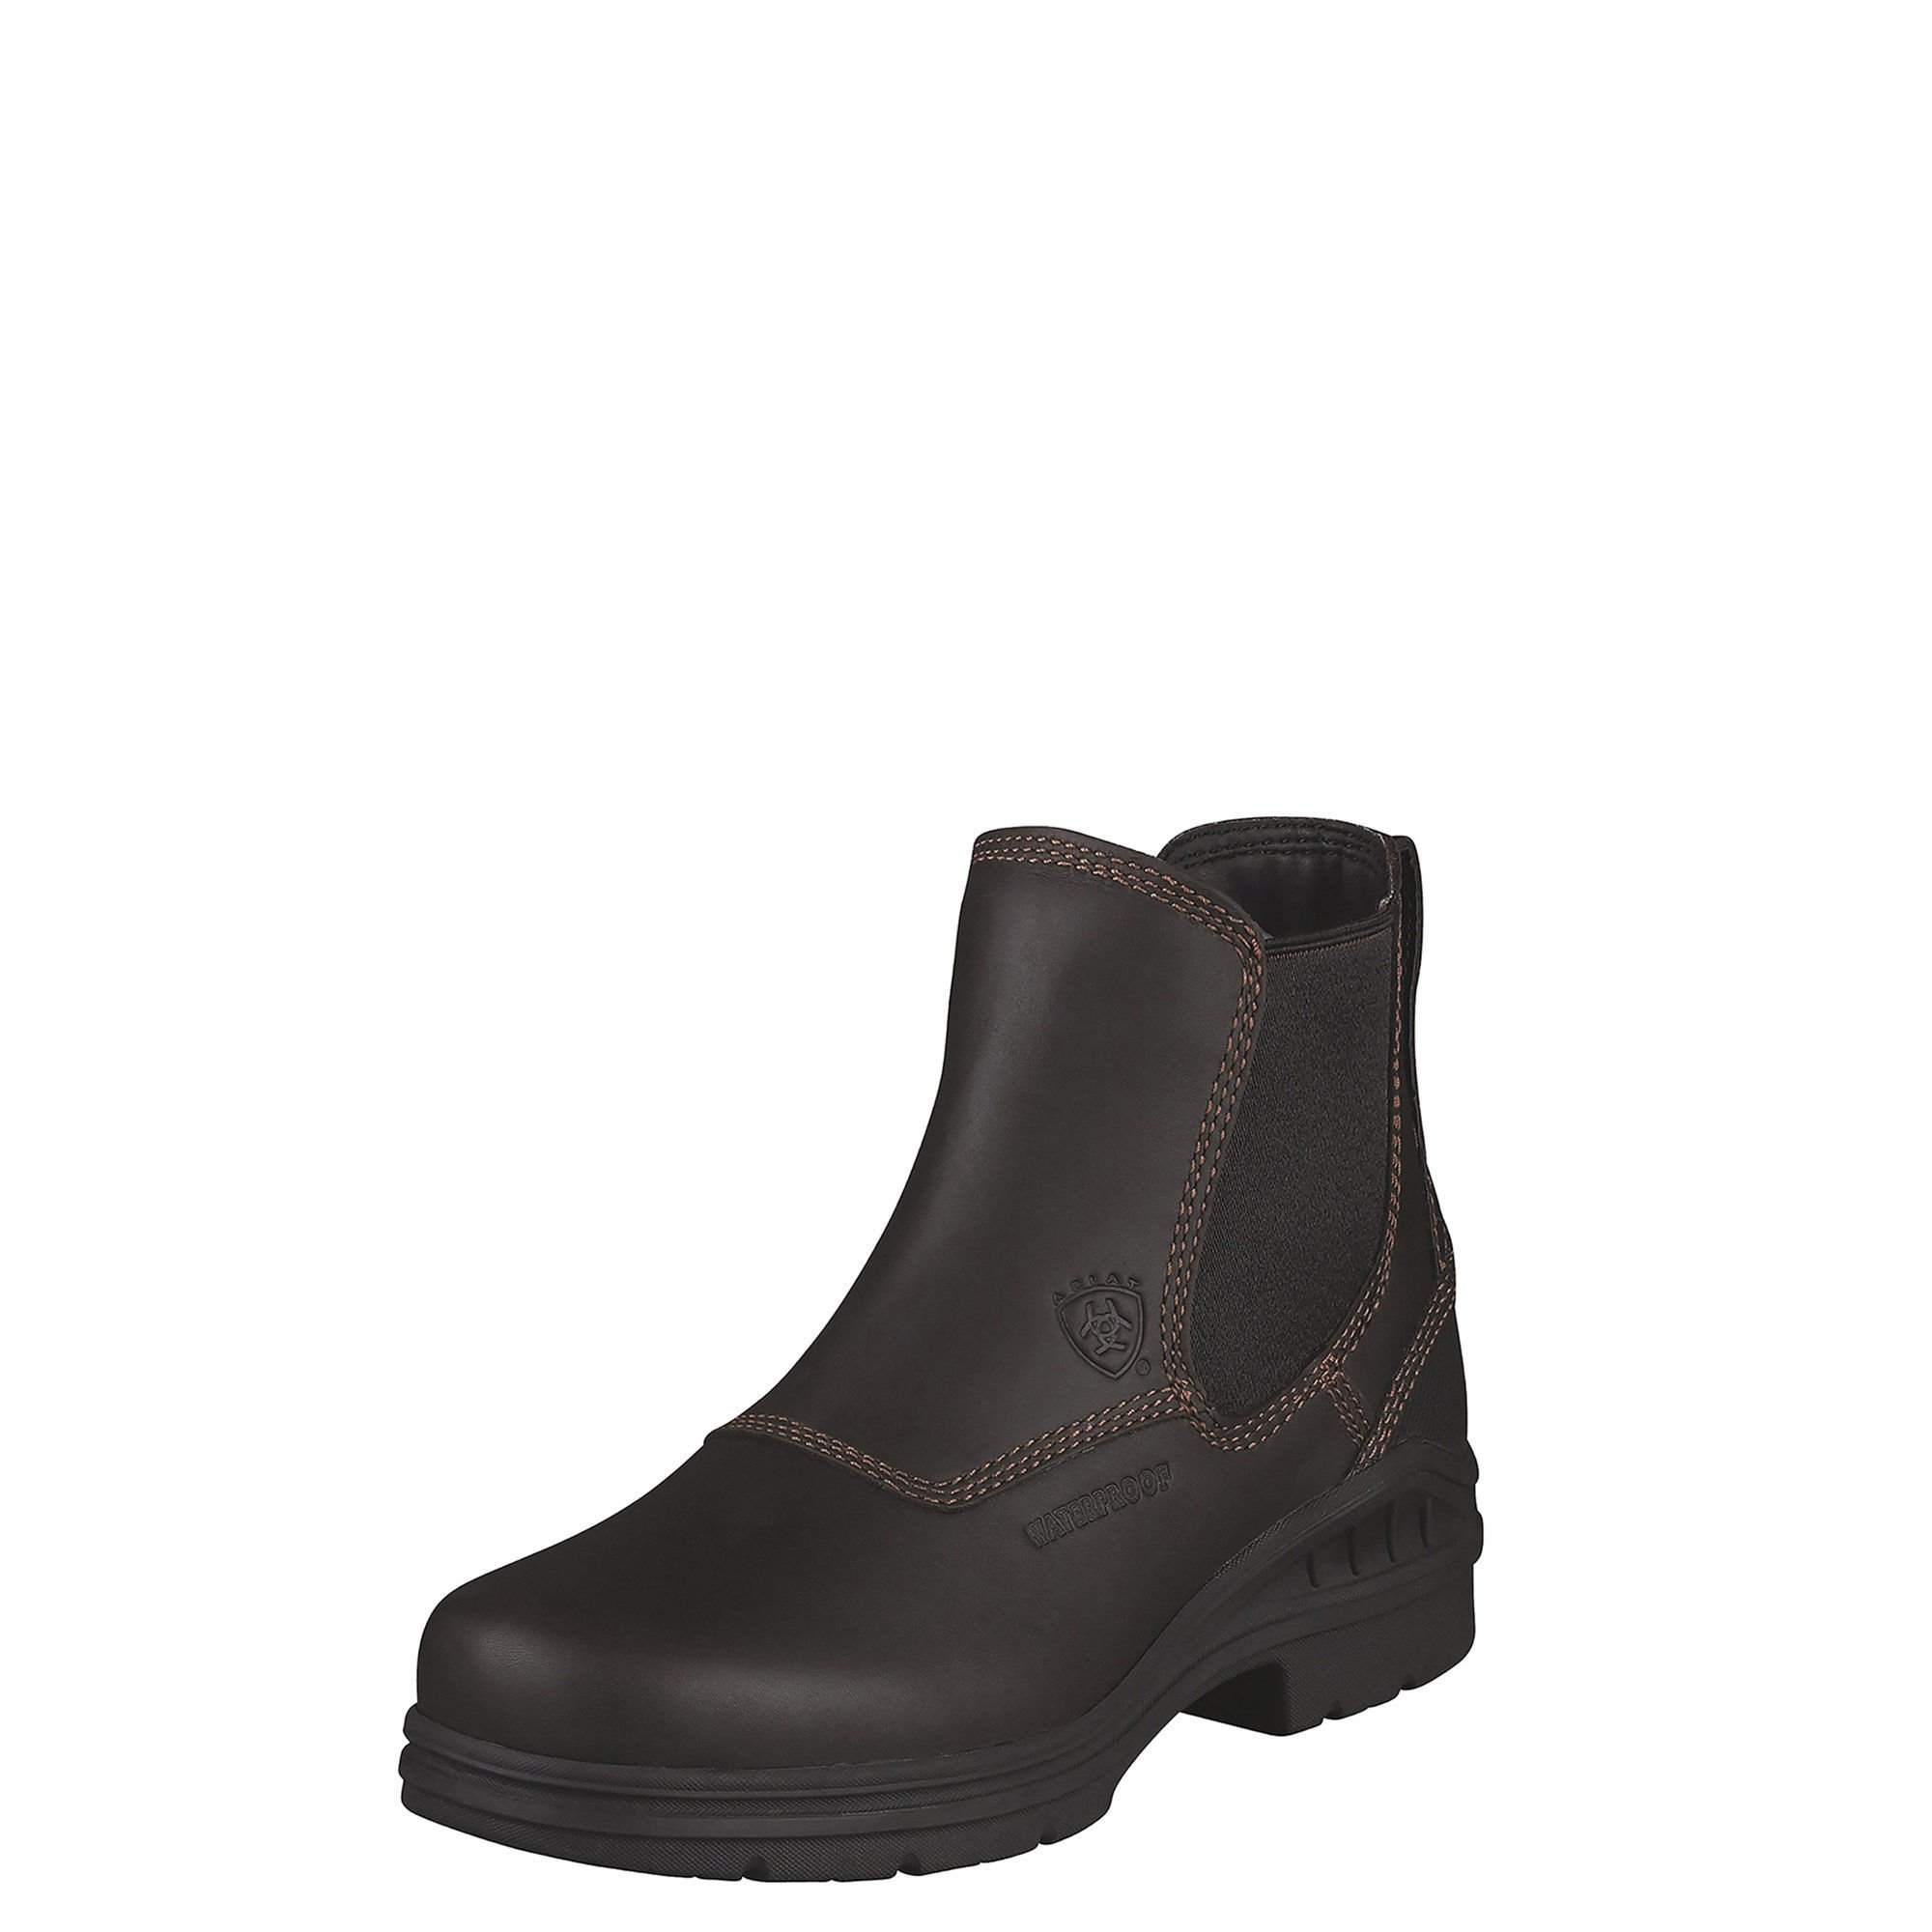 Ariat Women's Barnyard Twin Gore H2O Barn Boot, Dark Brown, 7.5 M US